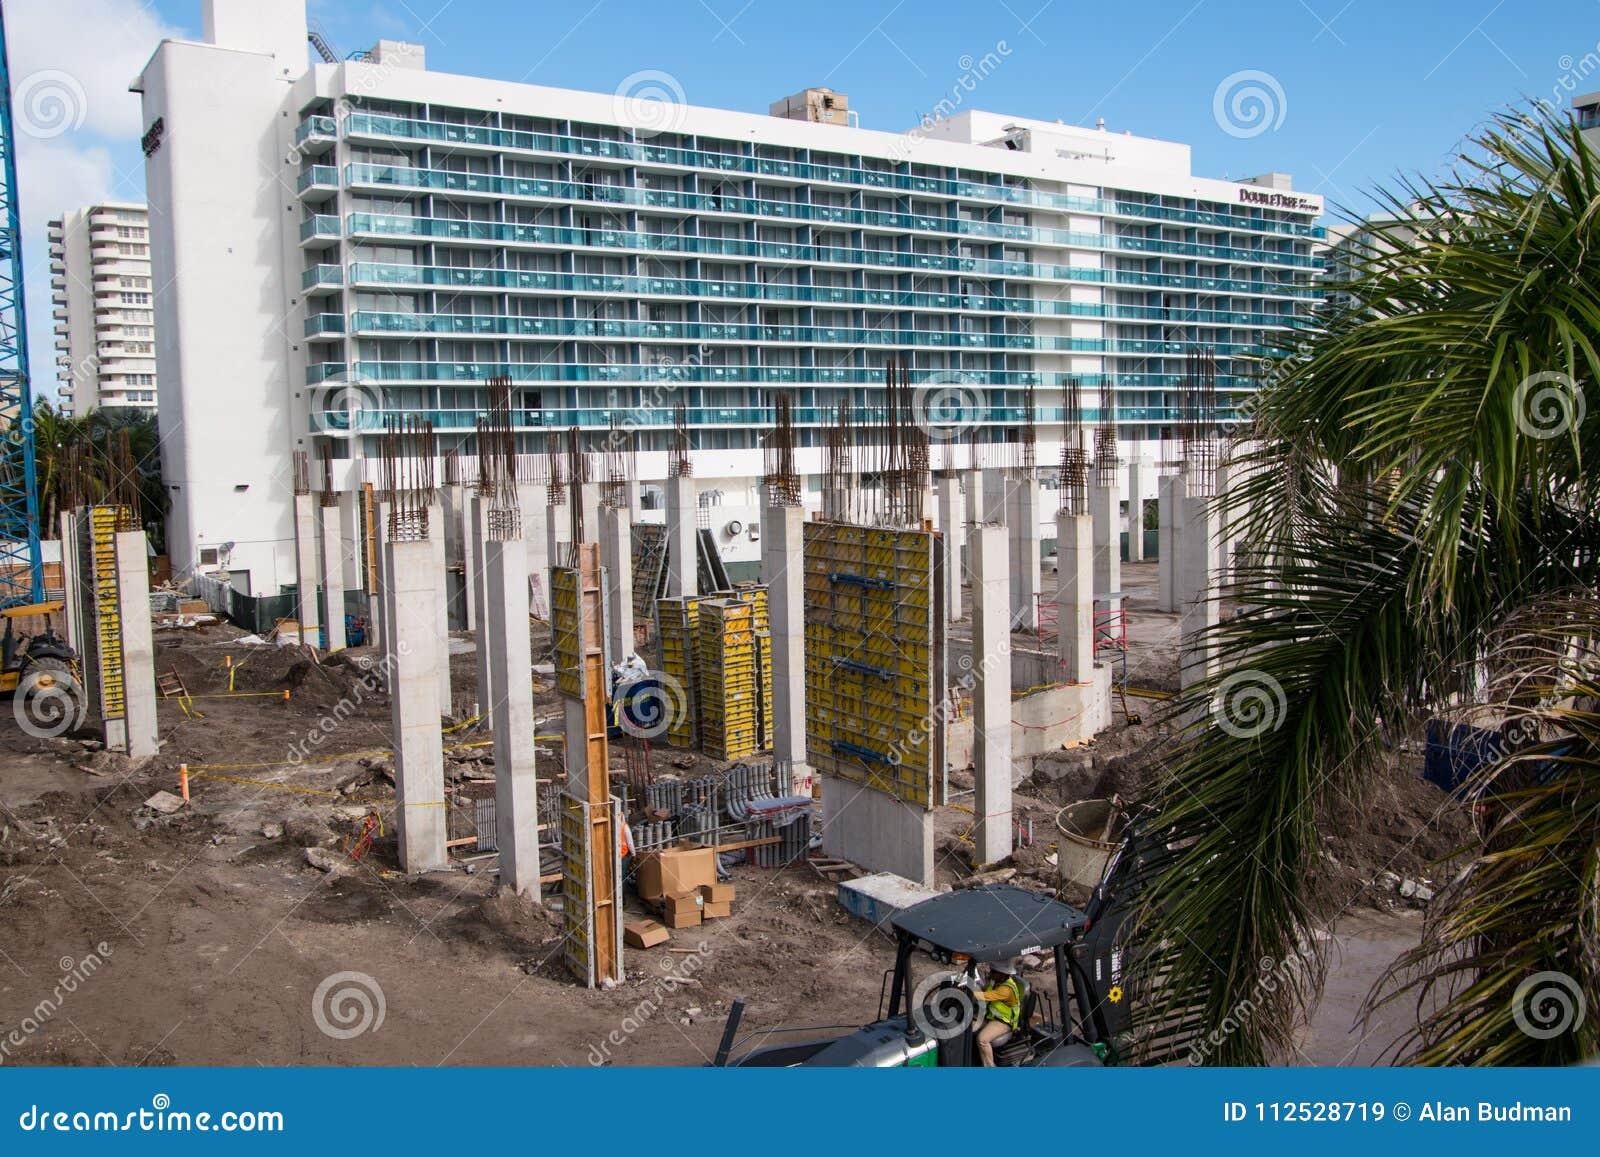 Construction site in Hallandale Florida